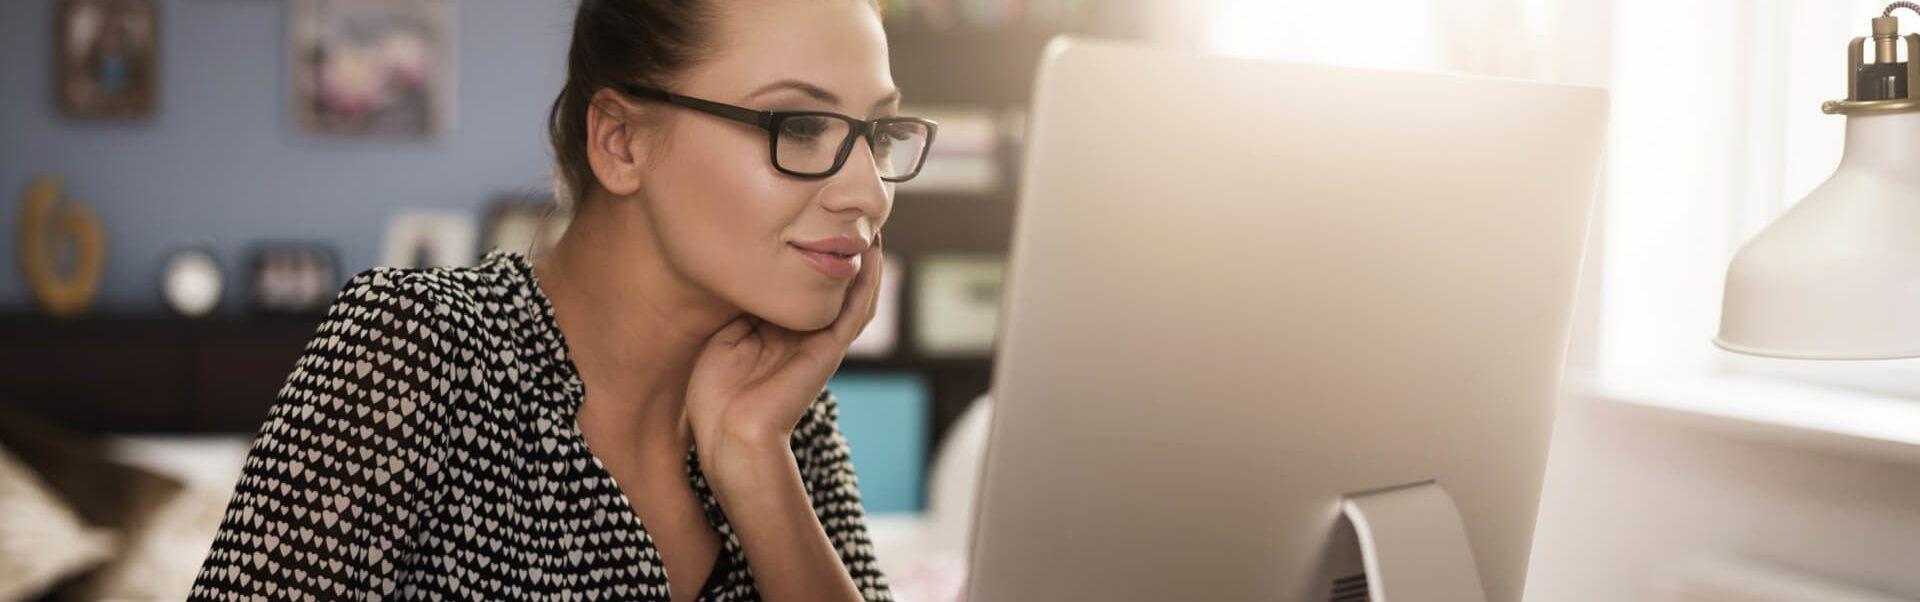 Mulher empreendedora a consultar os apoios do progama adaptar